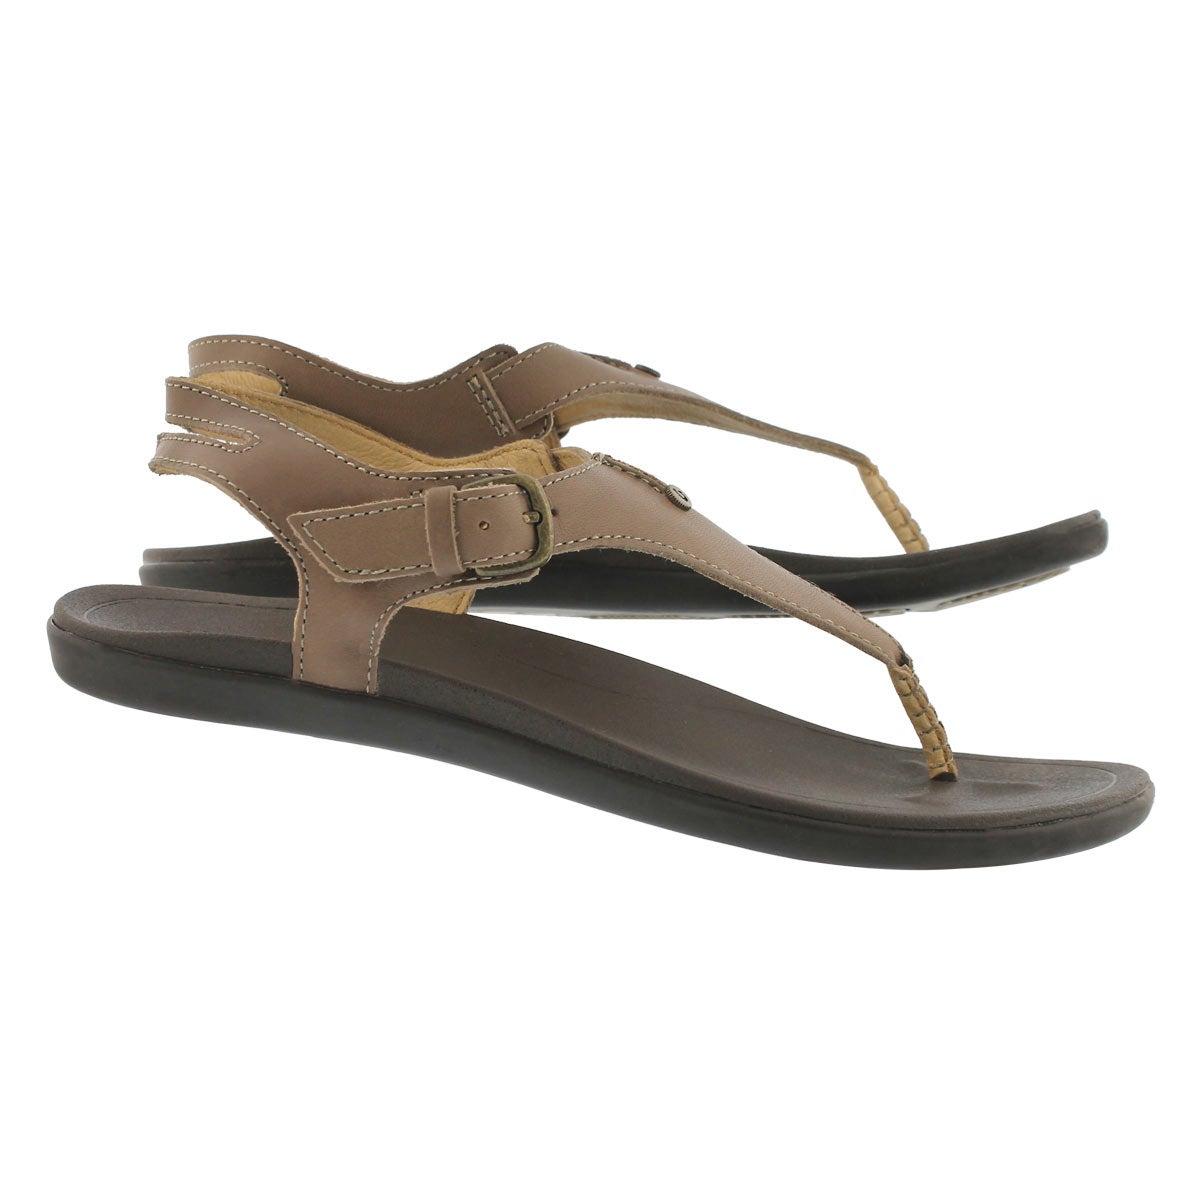 Women's EHEU clay/dk java thong sandals